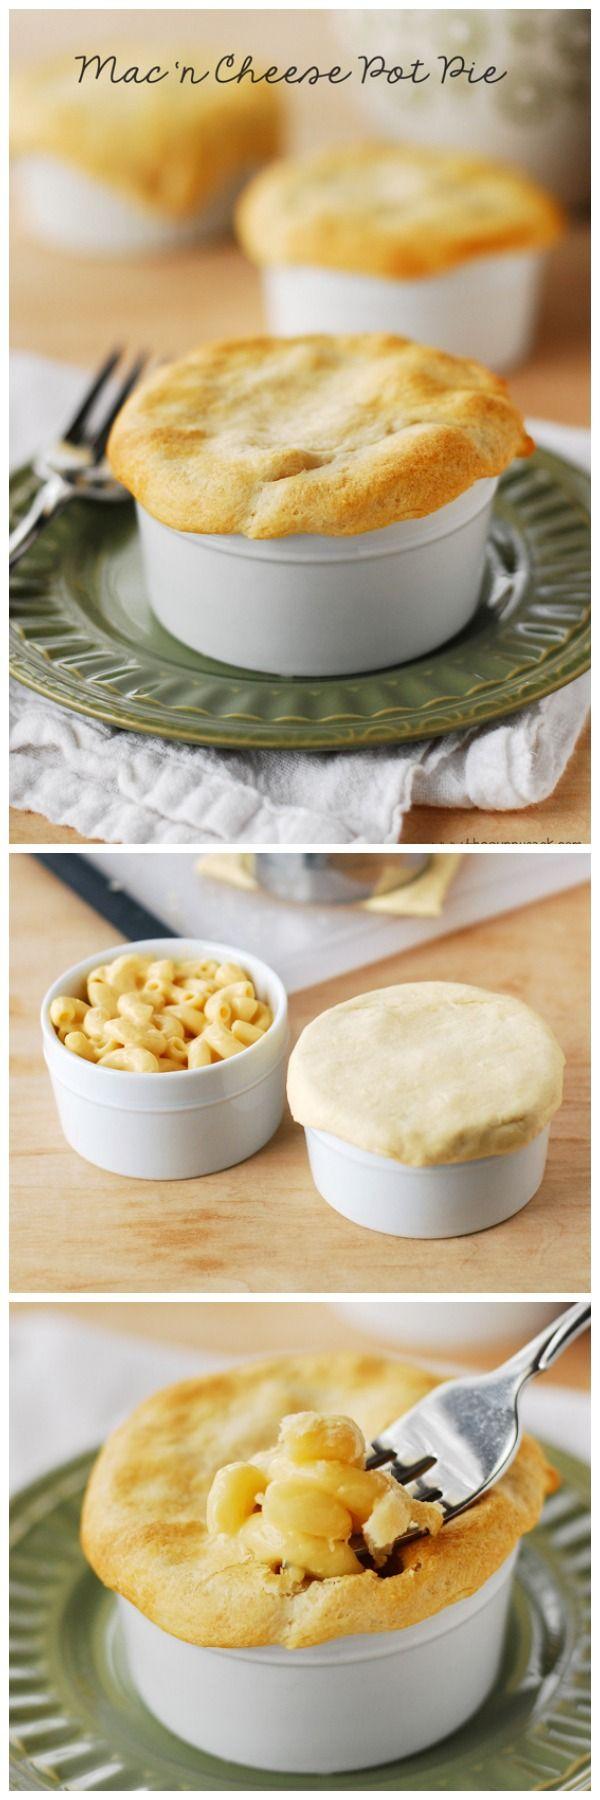 Macaroni and Cheese Pot Pie | http://www.thegunnysack.com/